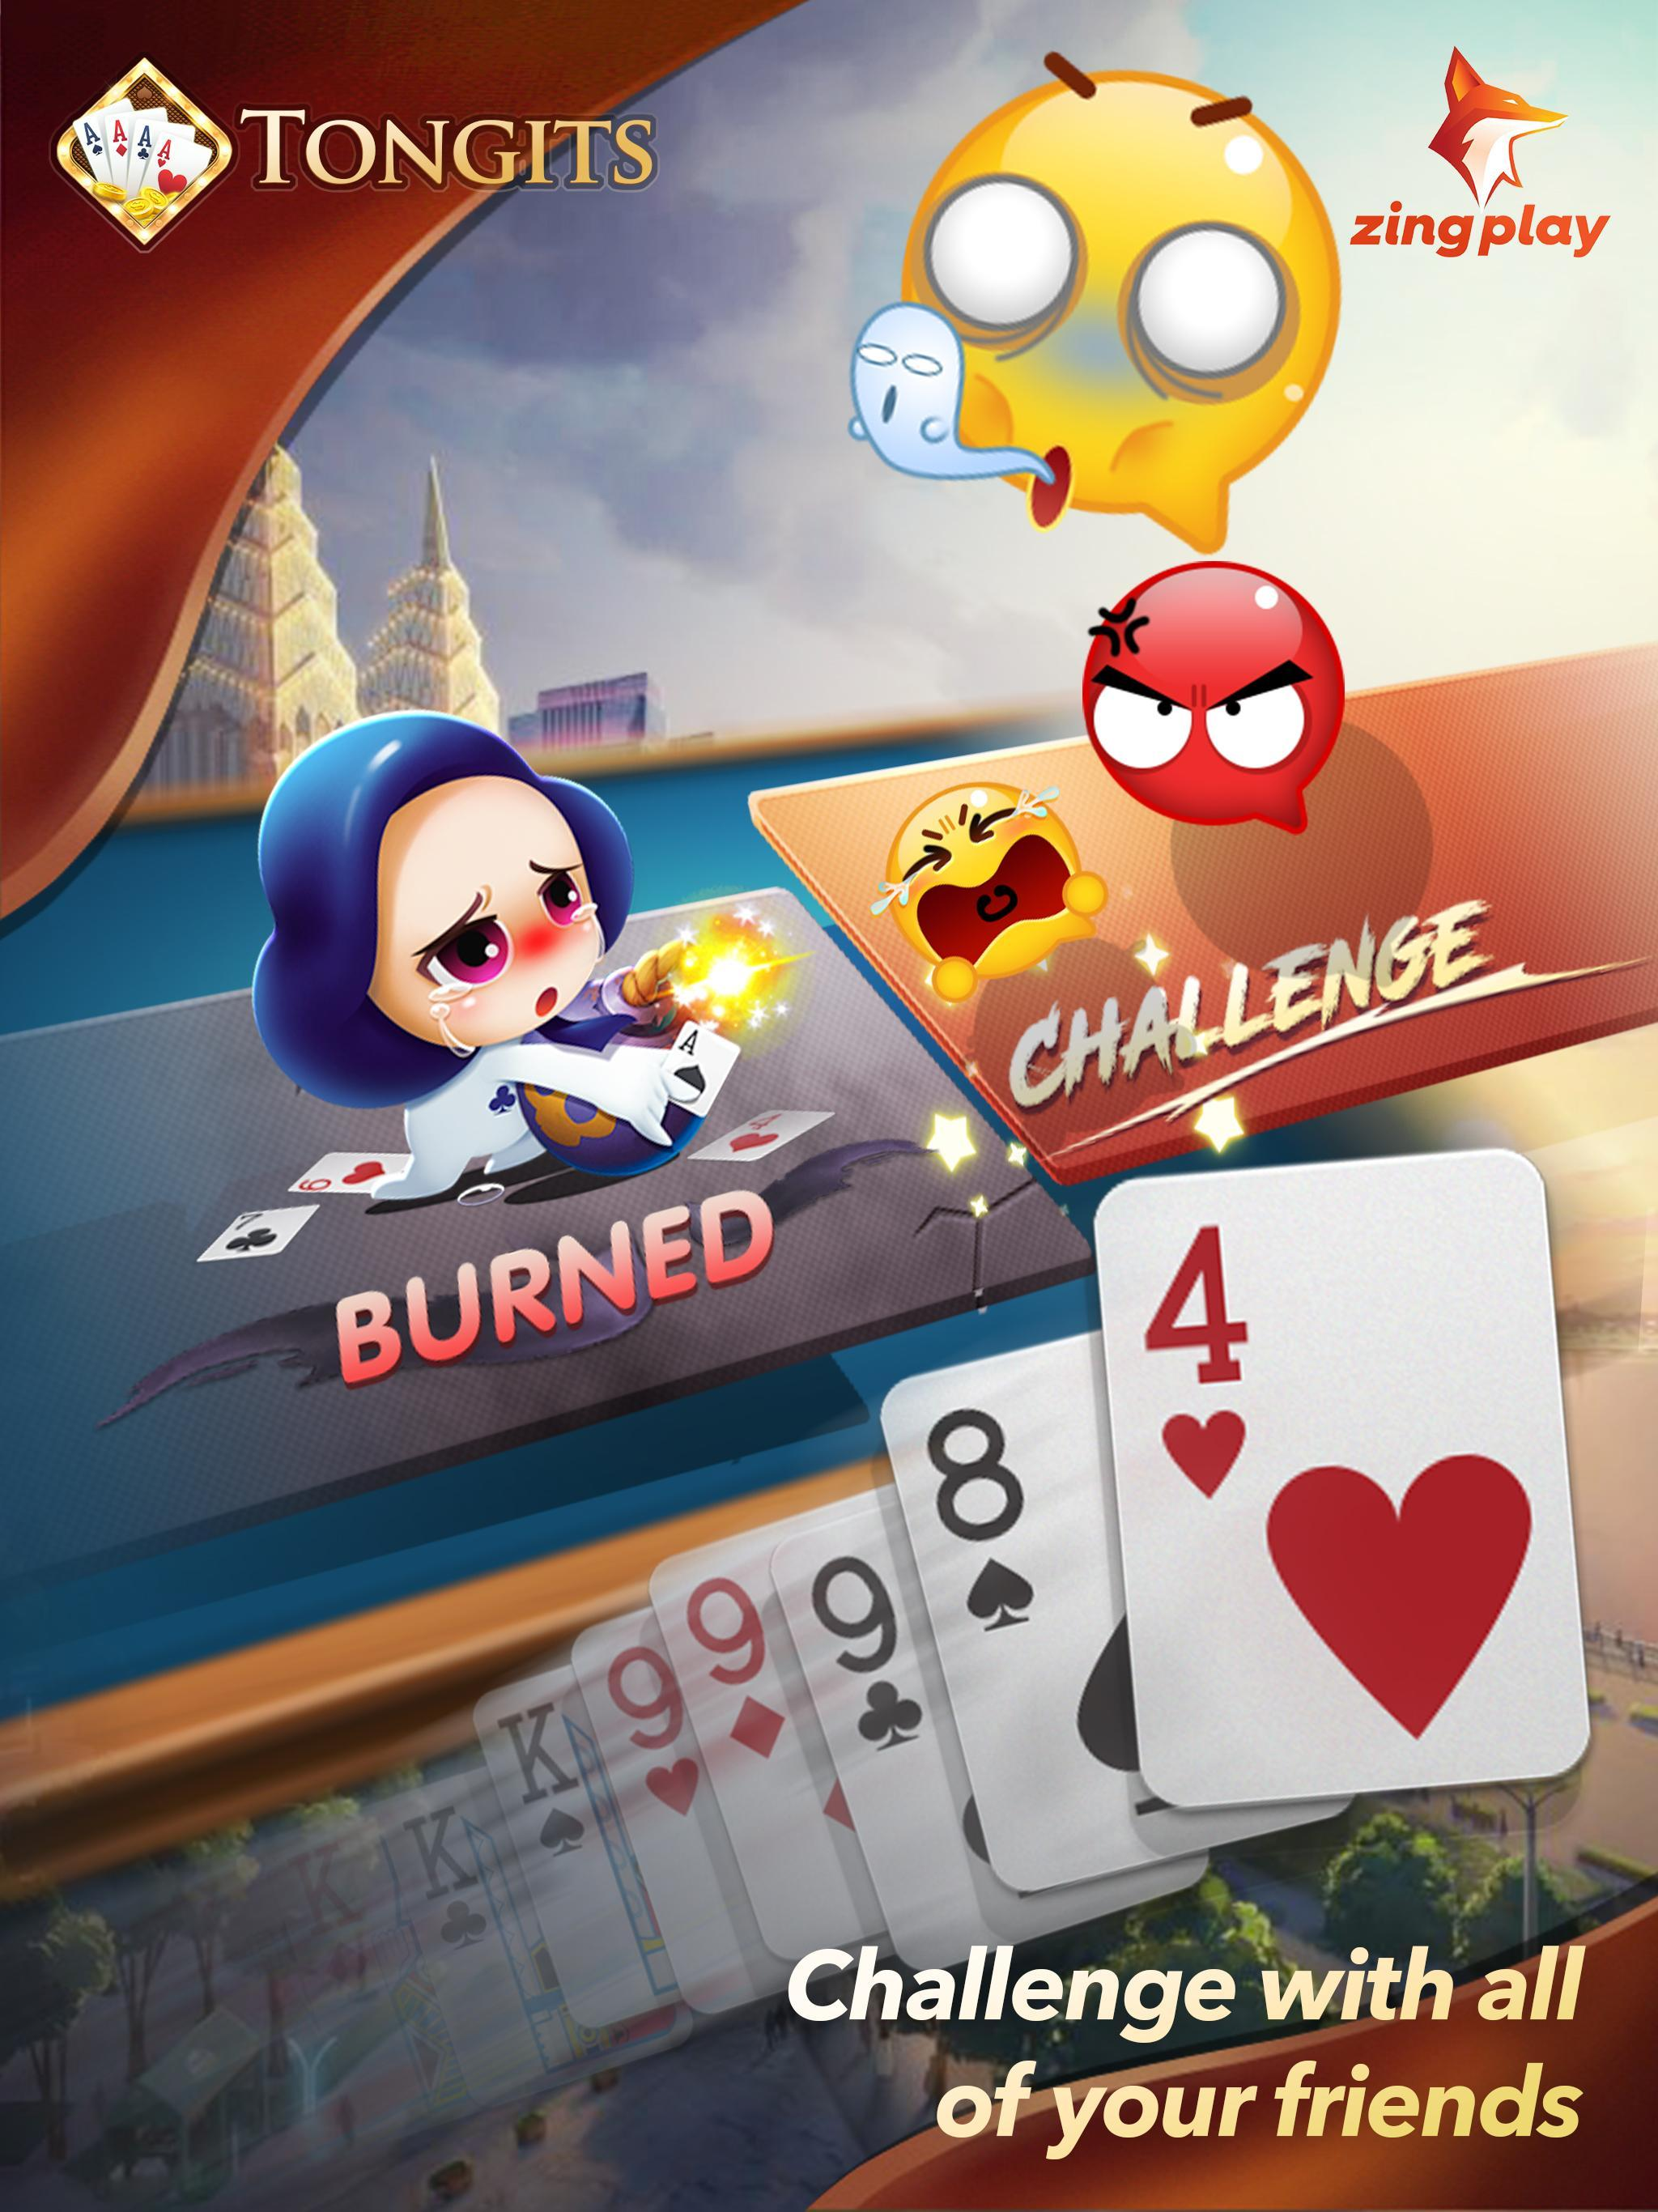 Tongits ZingPlay - Top 1 Free Card Game Online 2.3 Screenshot 9